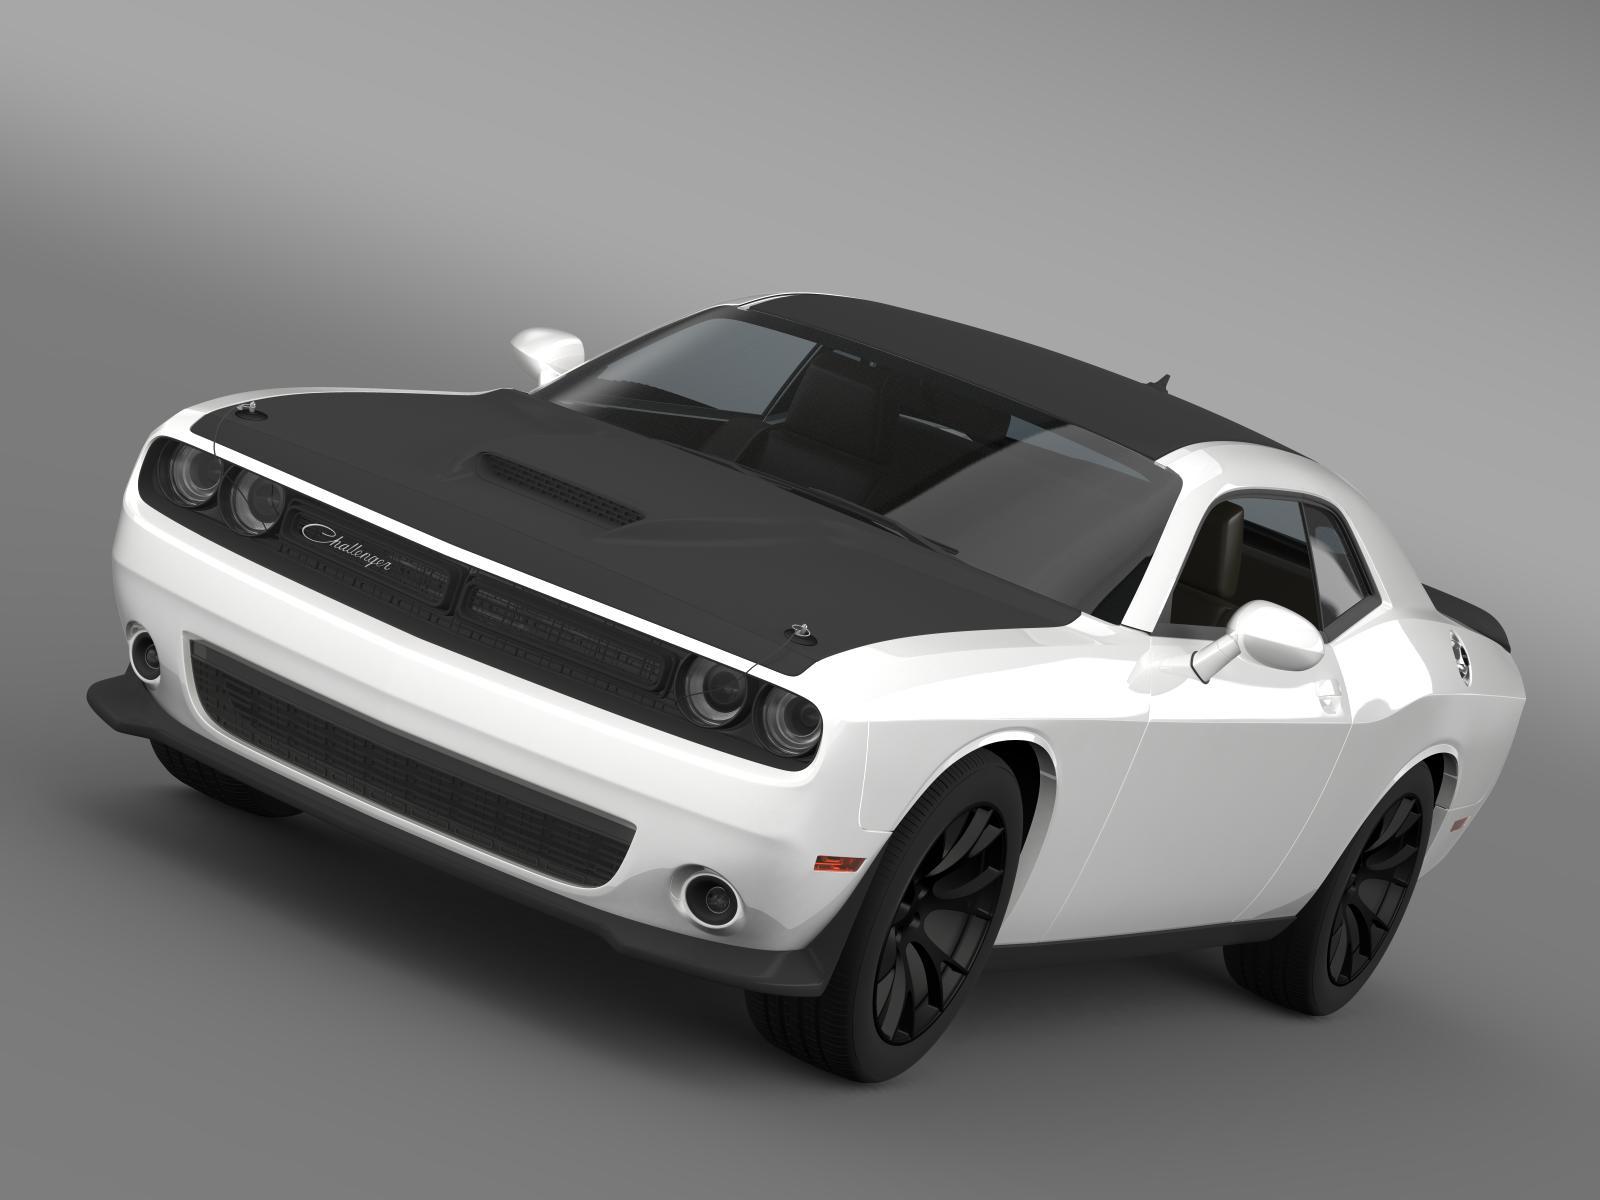 Dodge dúshlán an choincheapa lc 2014 3d model 3ds max fbx c4d le hrc xsi obj 165763